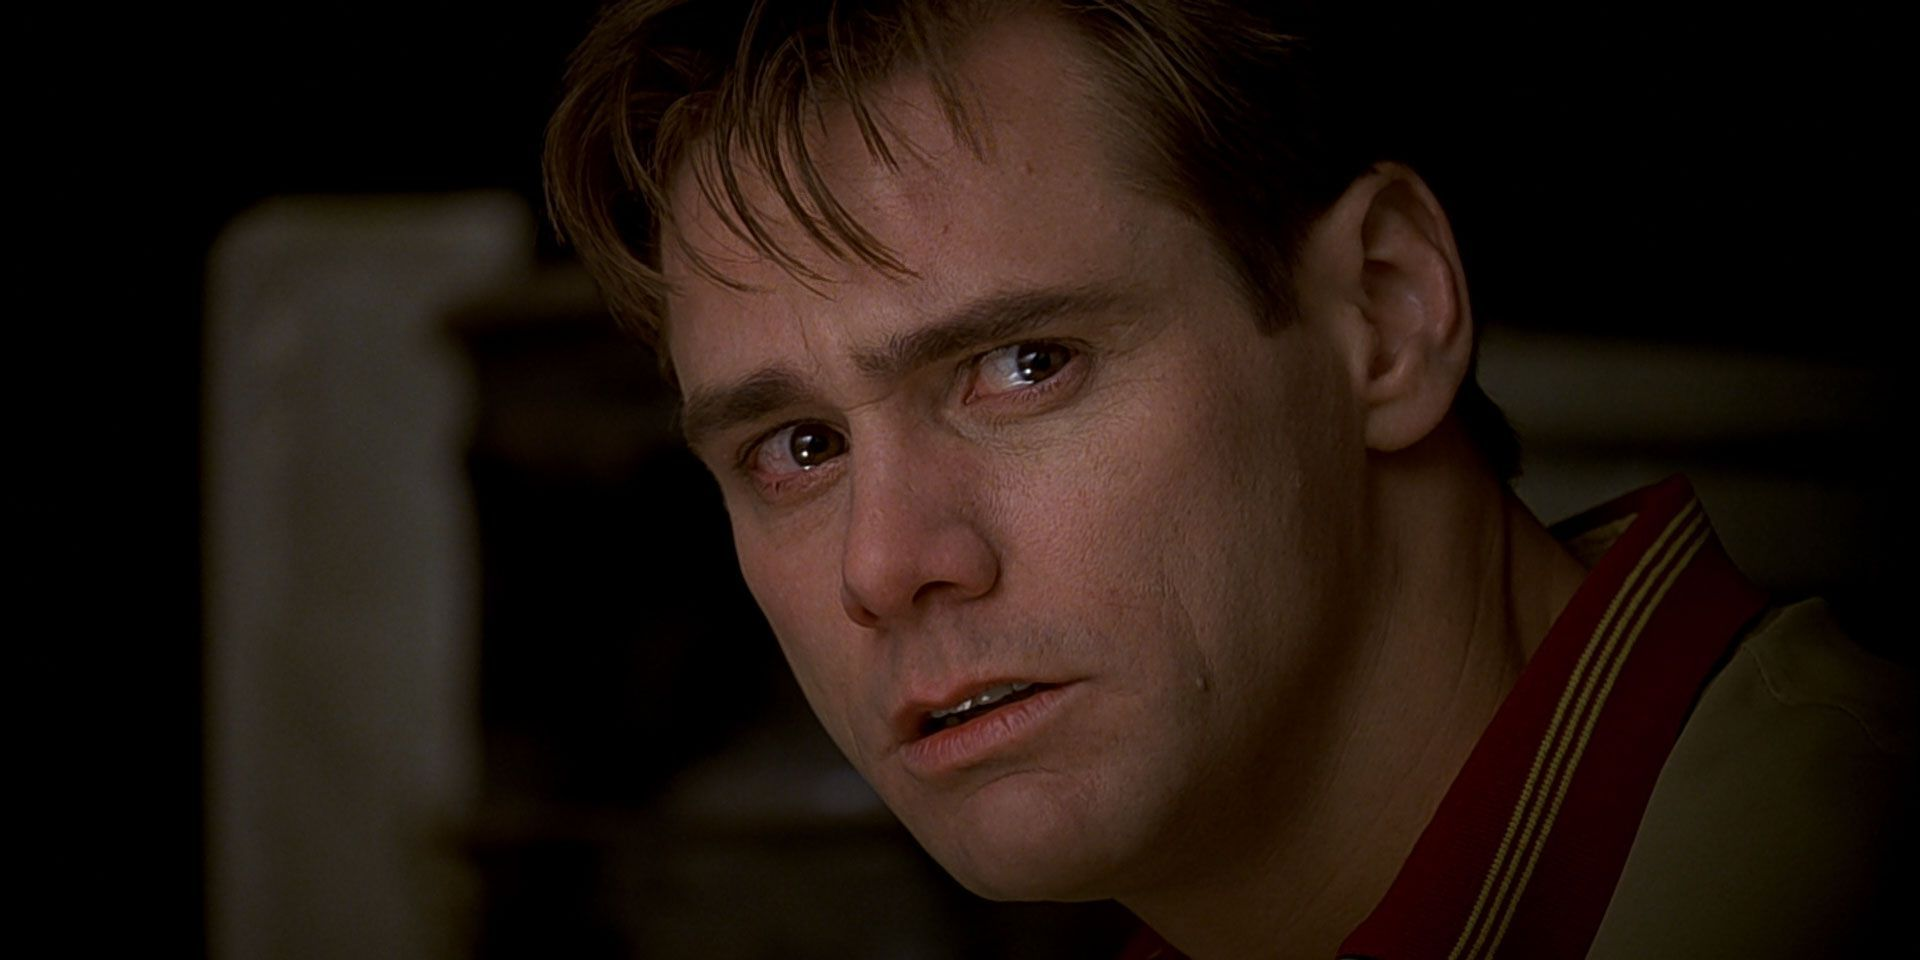 Jim Carrey, tear-eyed during a movie scene